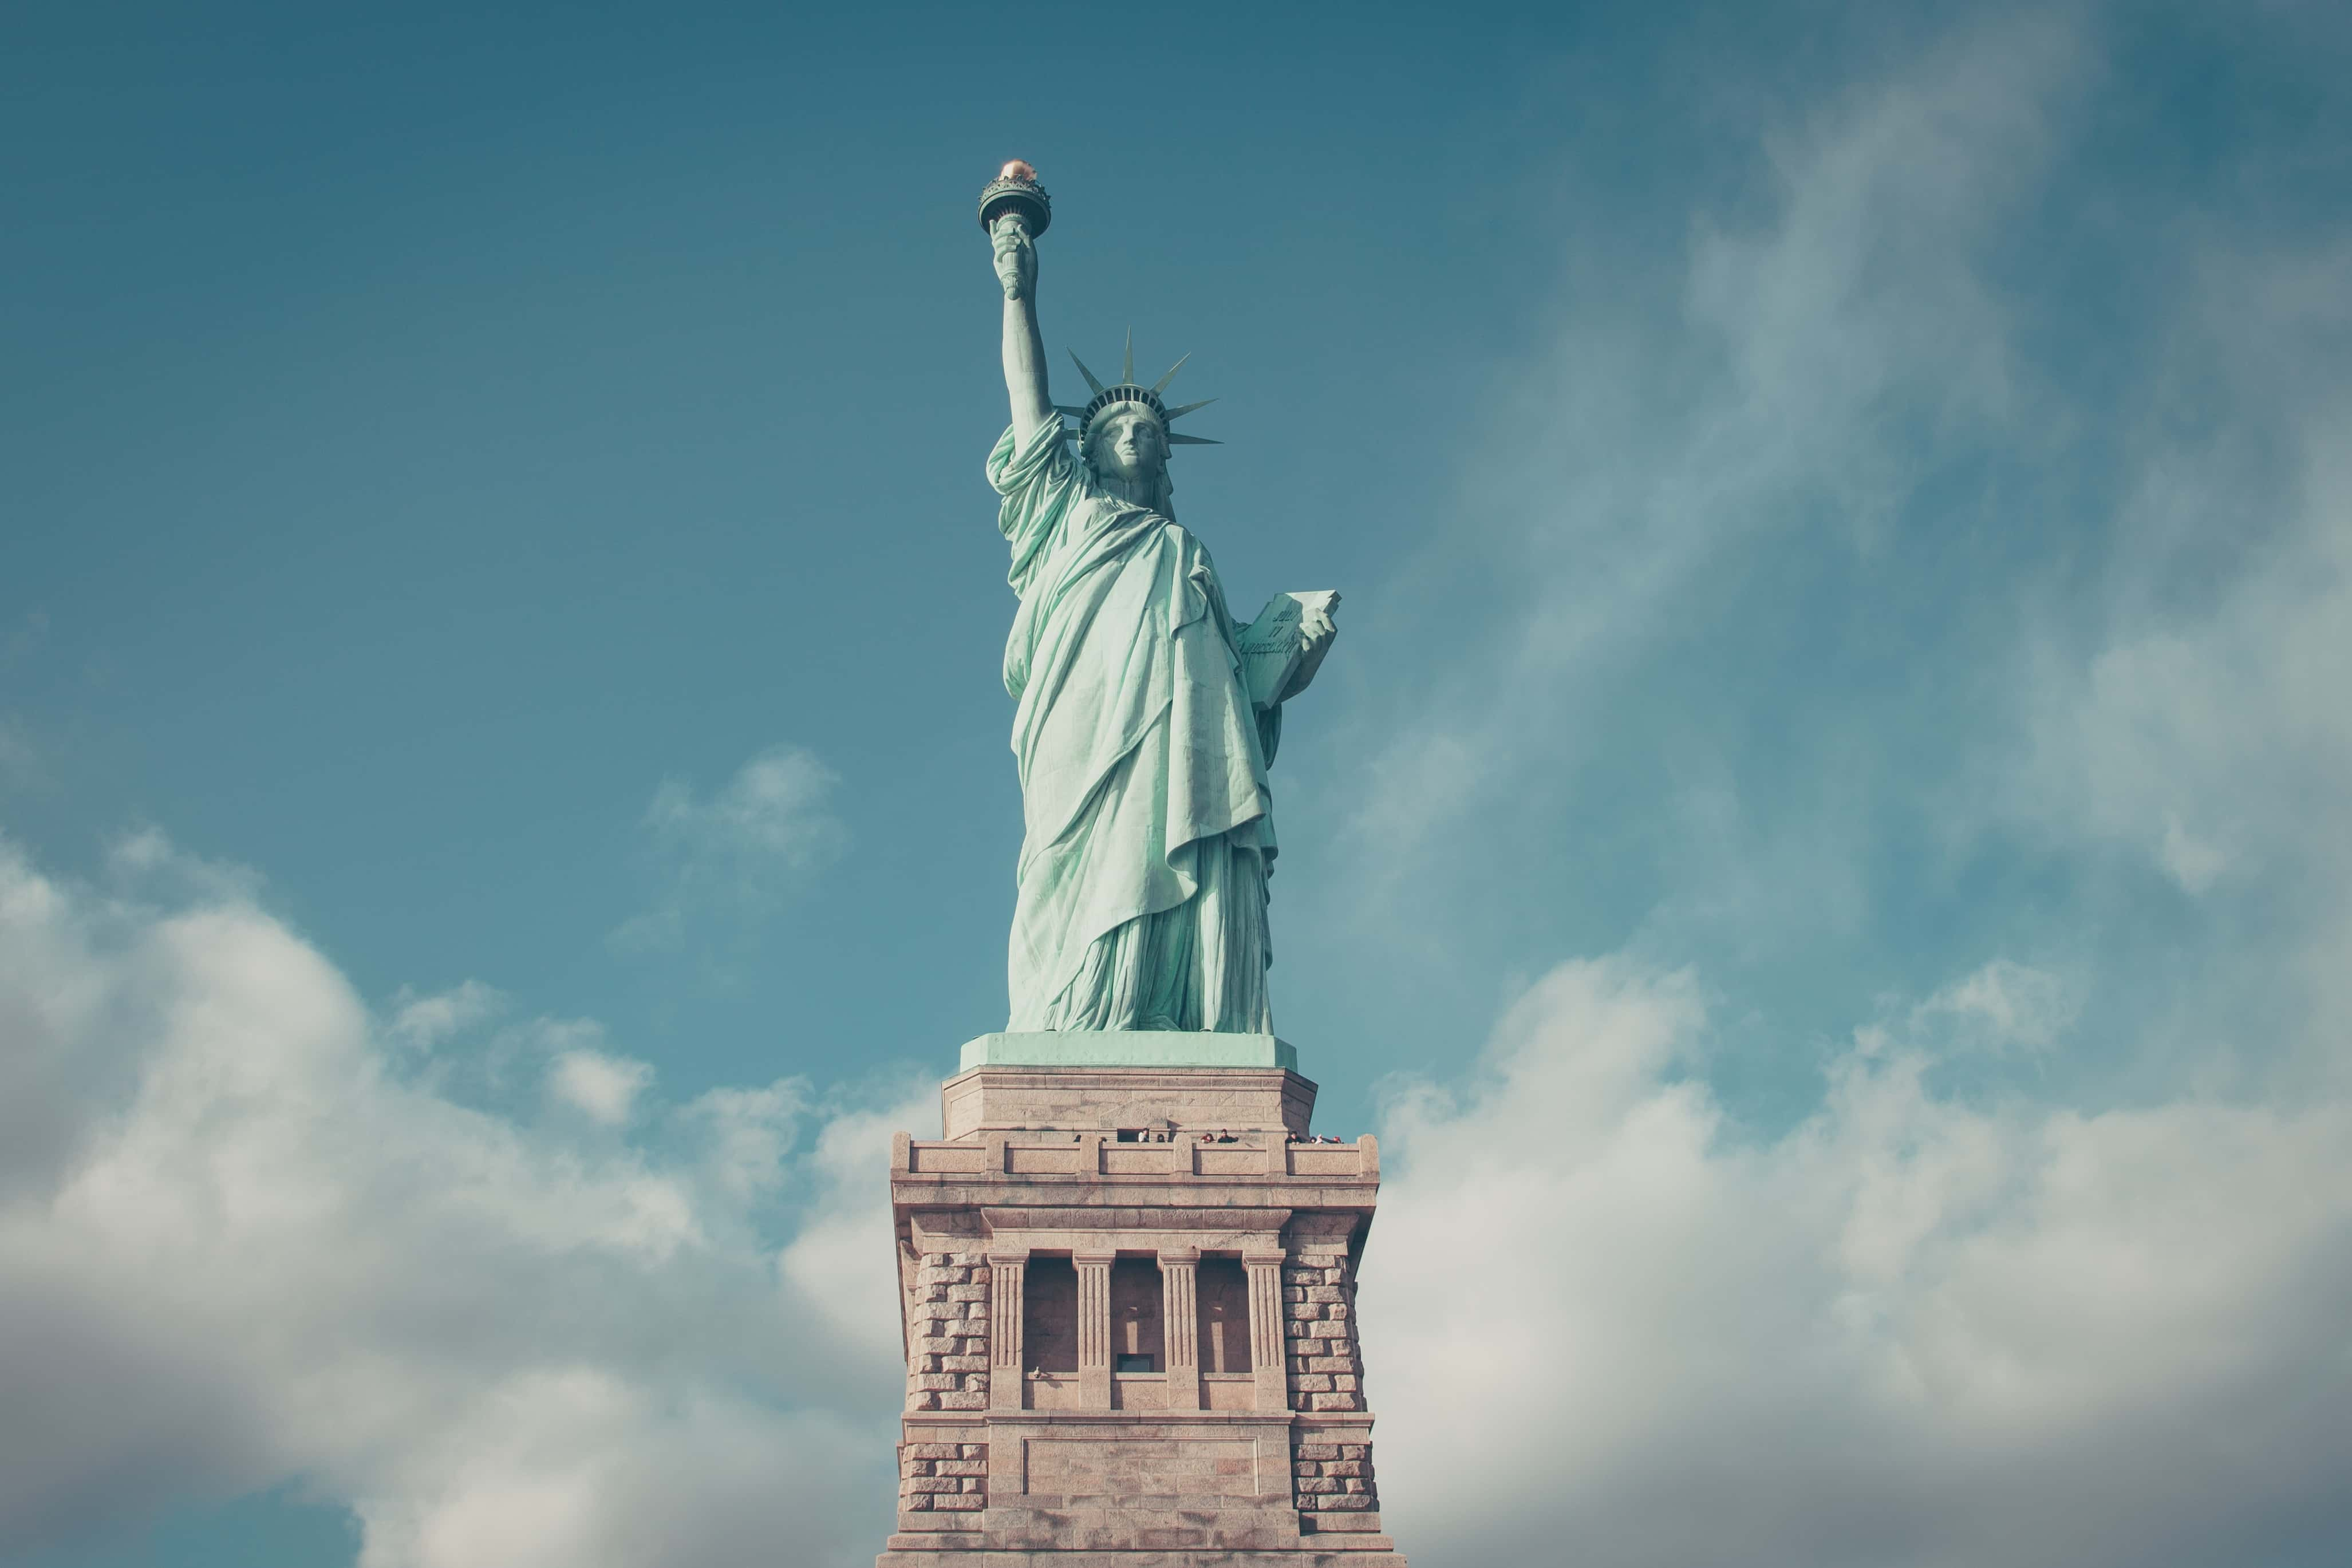 Nueva York de compras. NUBA Everywhere. Estatua de la libertad